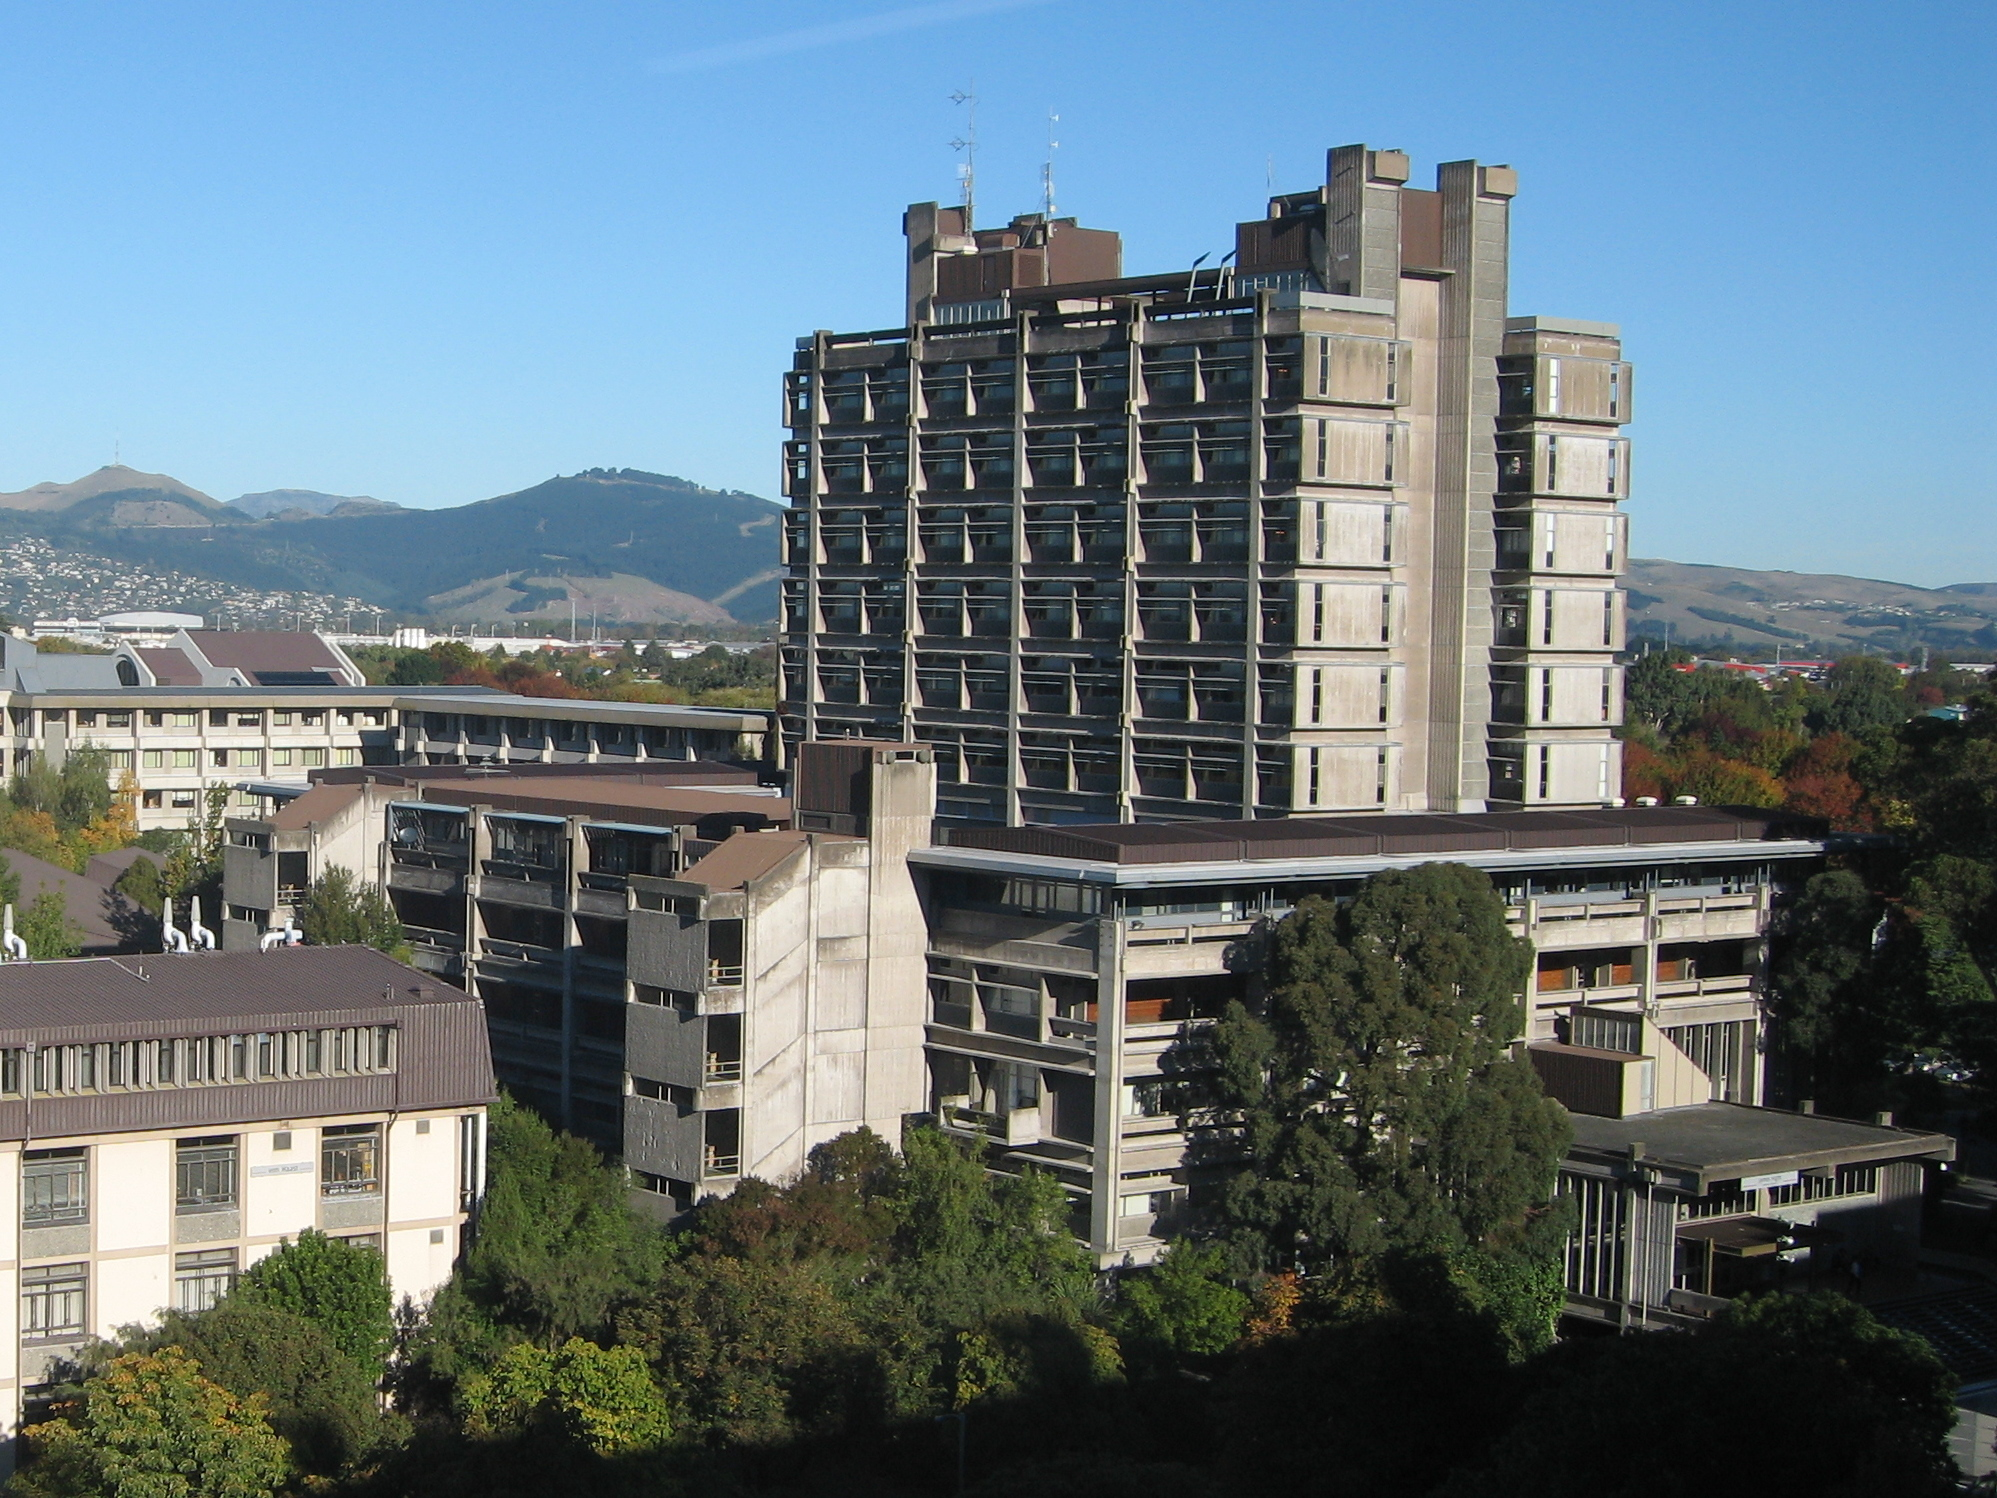 Christchurch Attack Wikipedia: University Of Canterbury